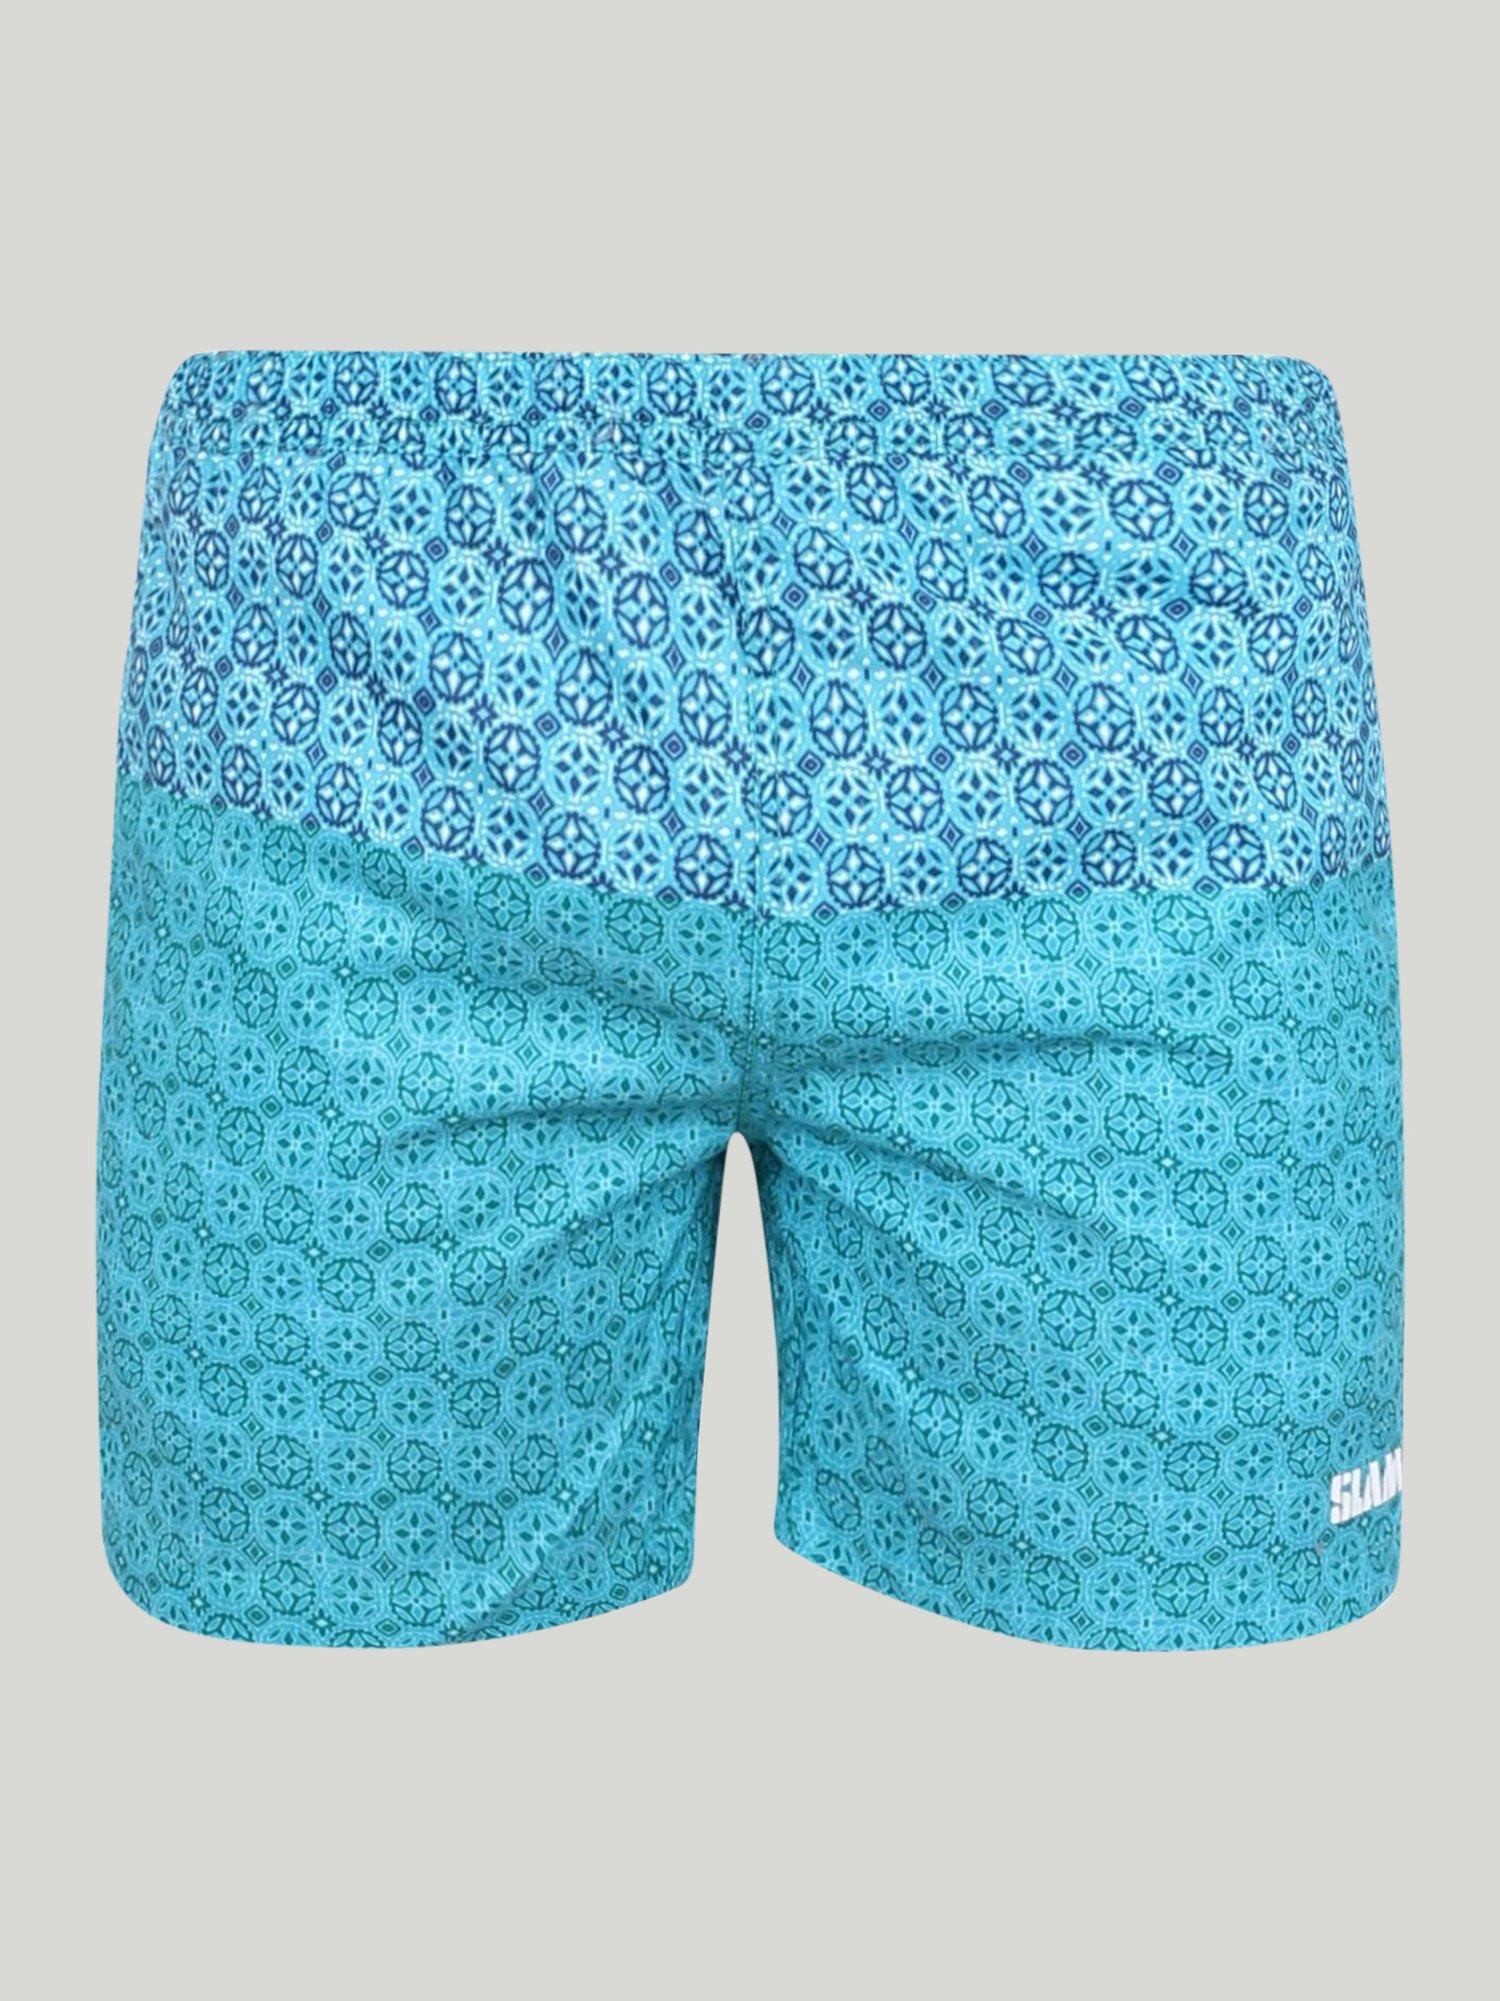 Viceversa swimsuit - Caribbean Blue